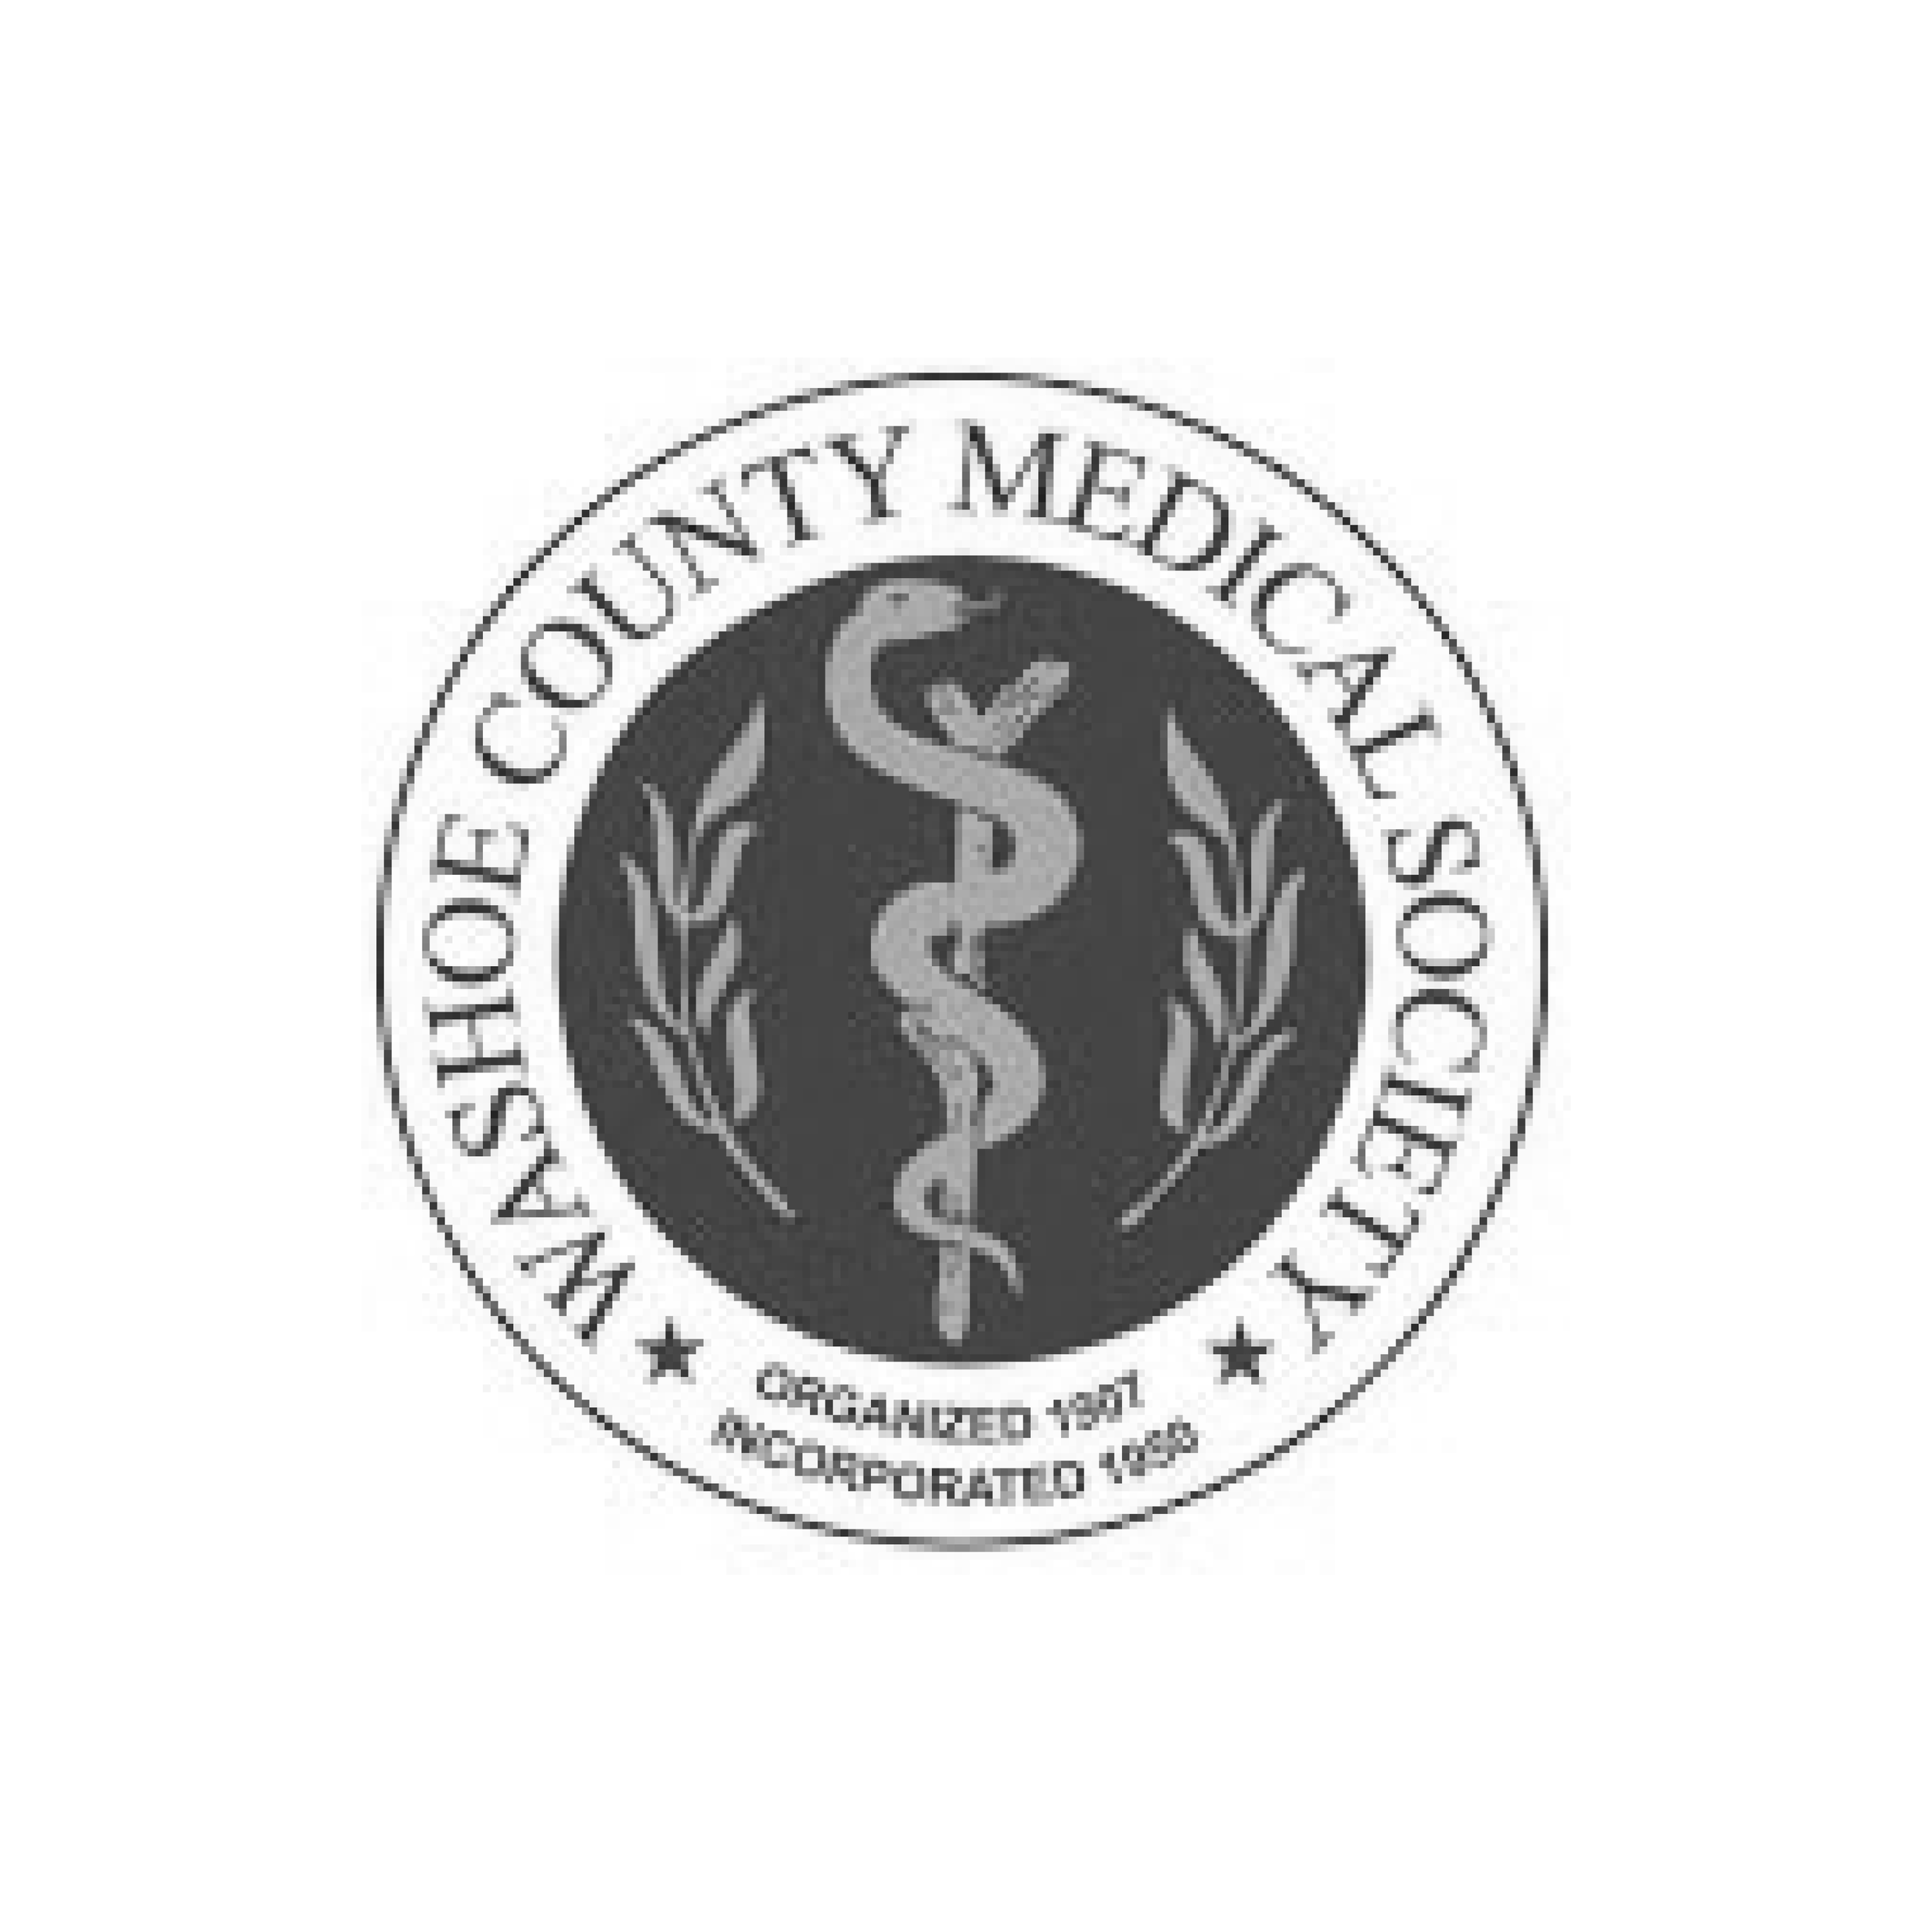 Washoe County Medical Society